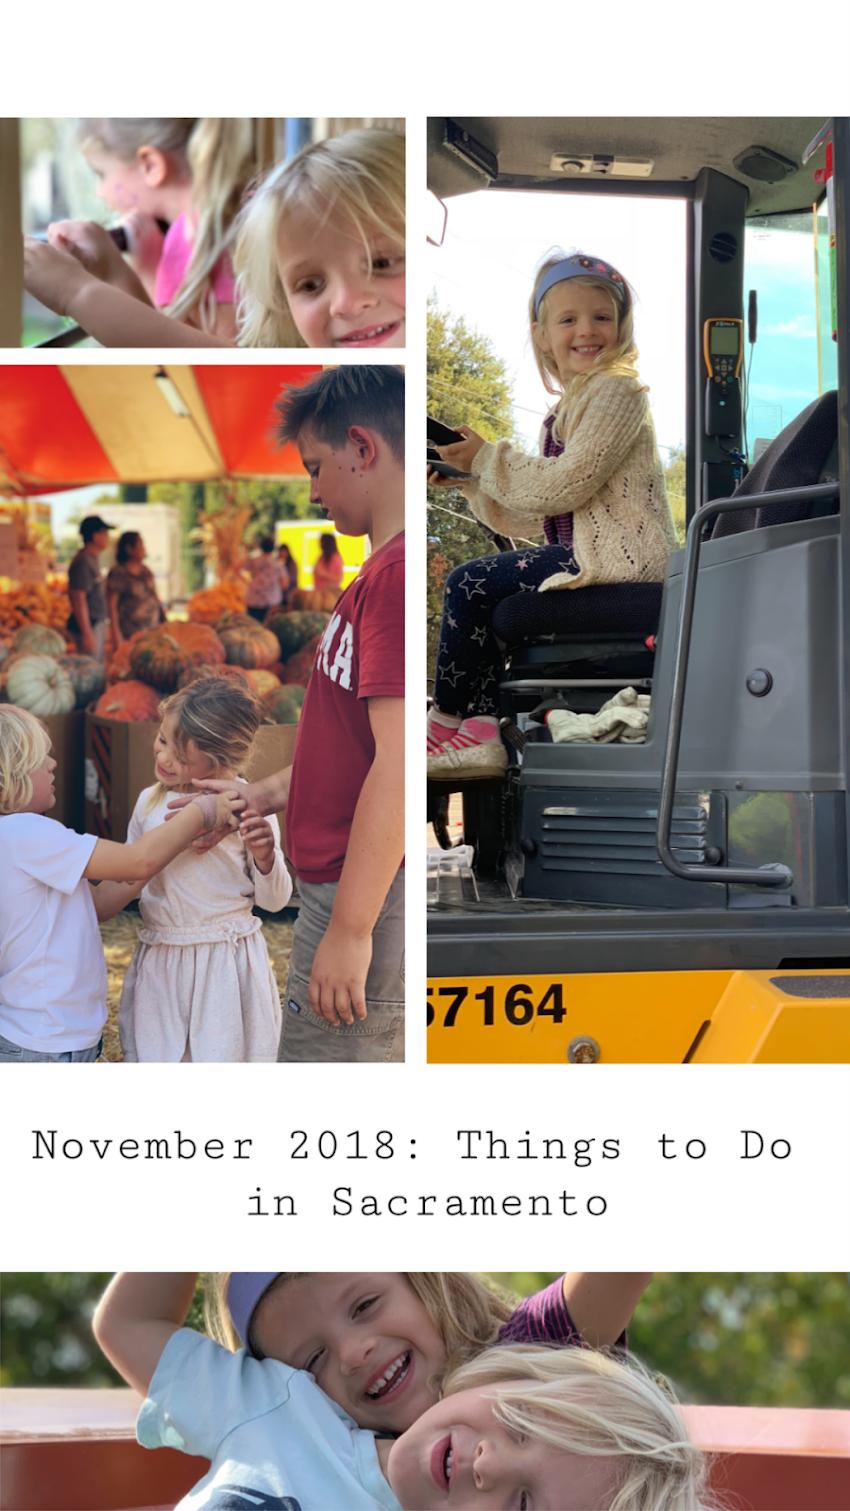 Things to Do: November 2018